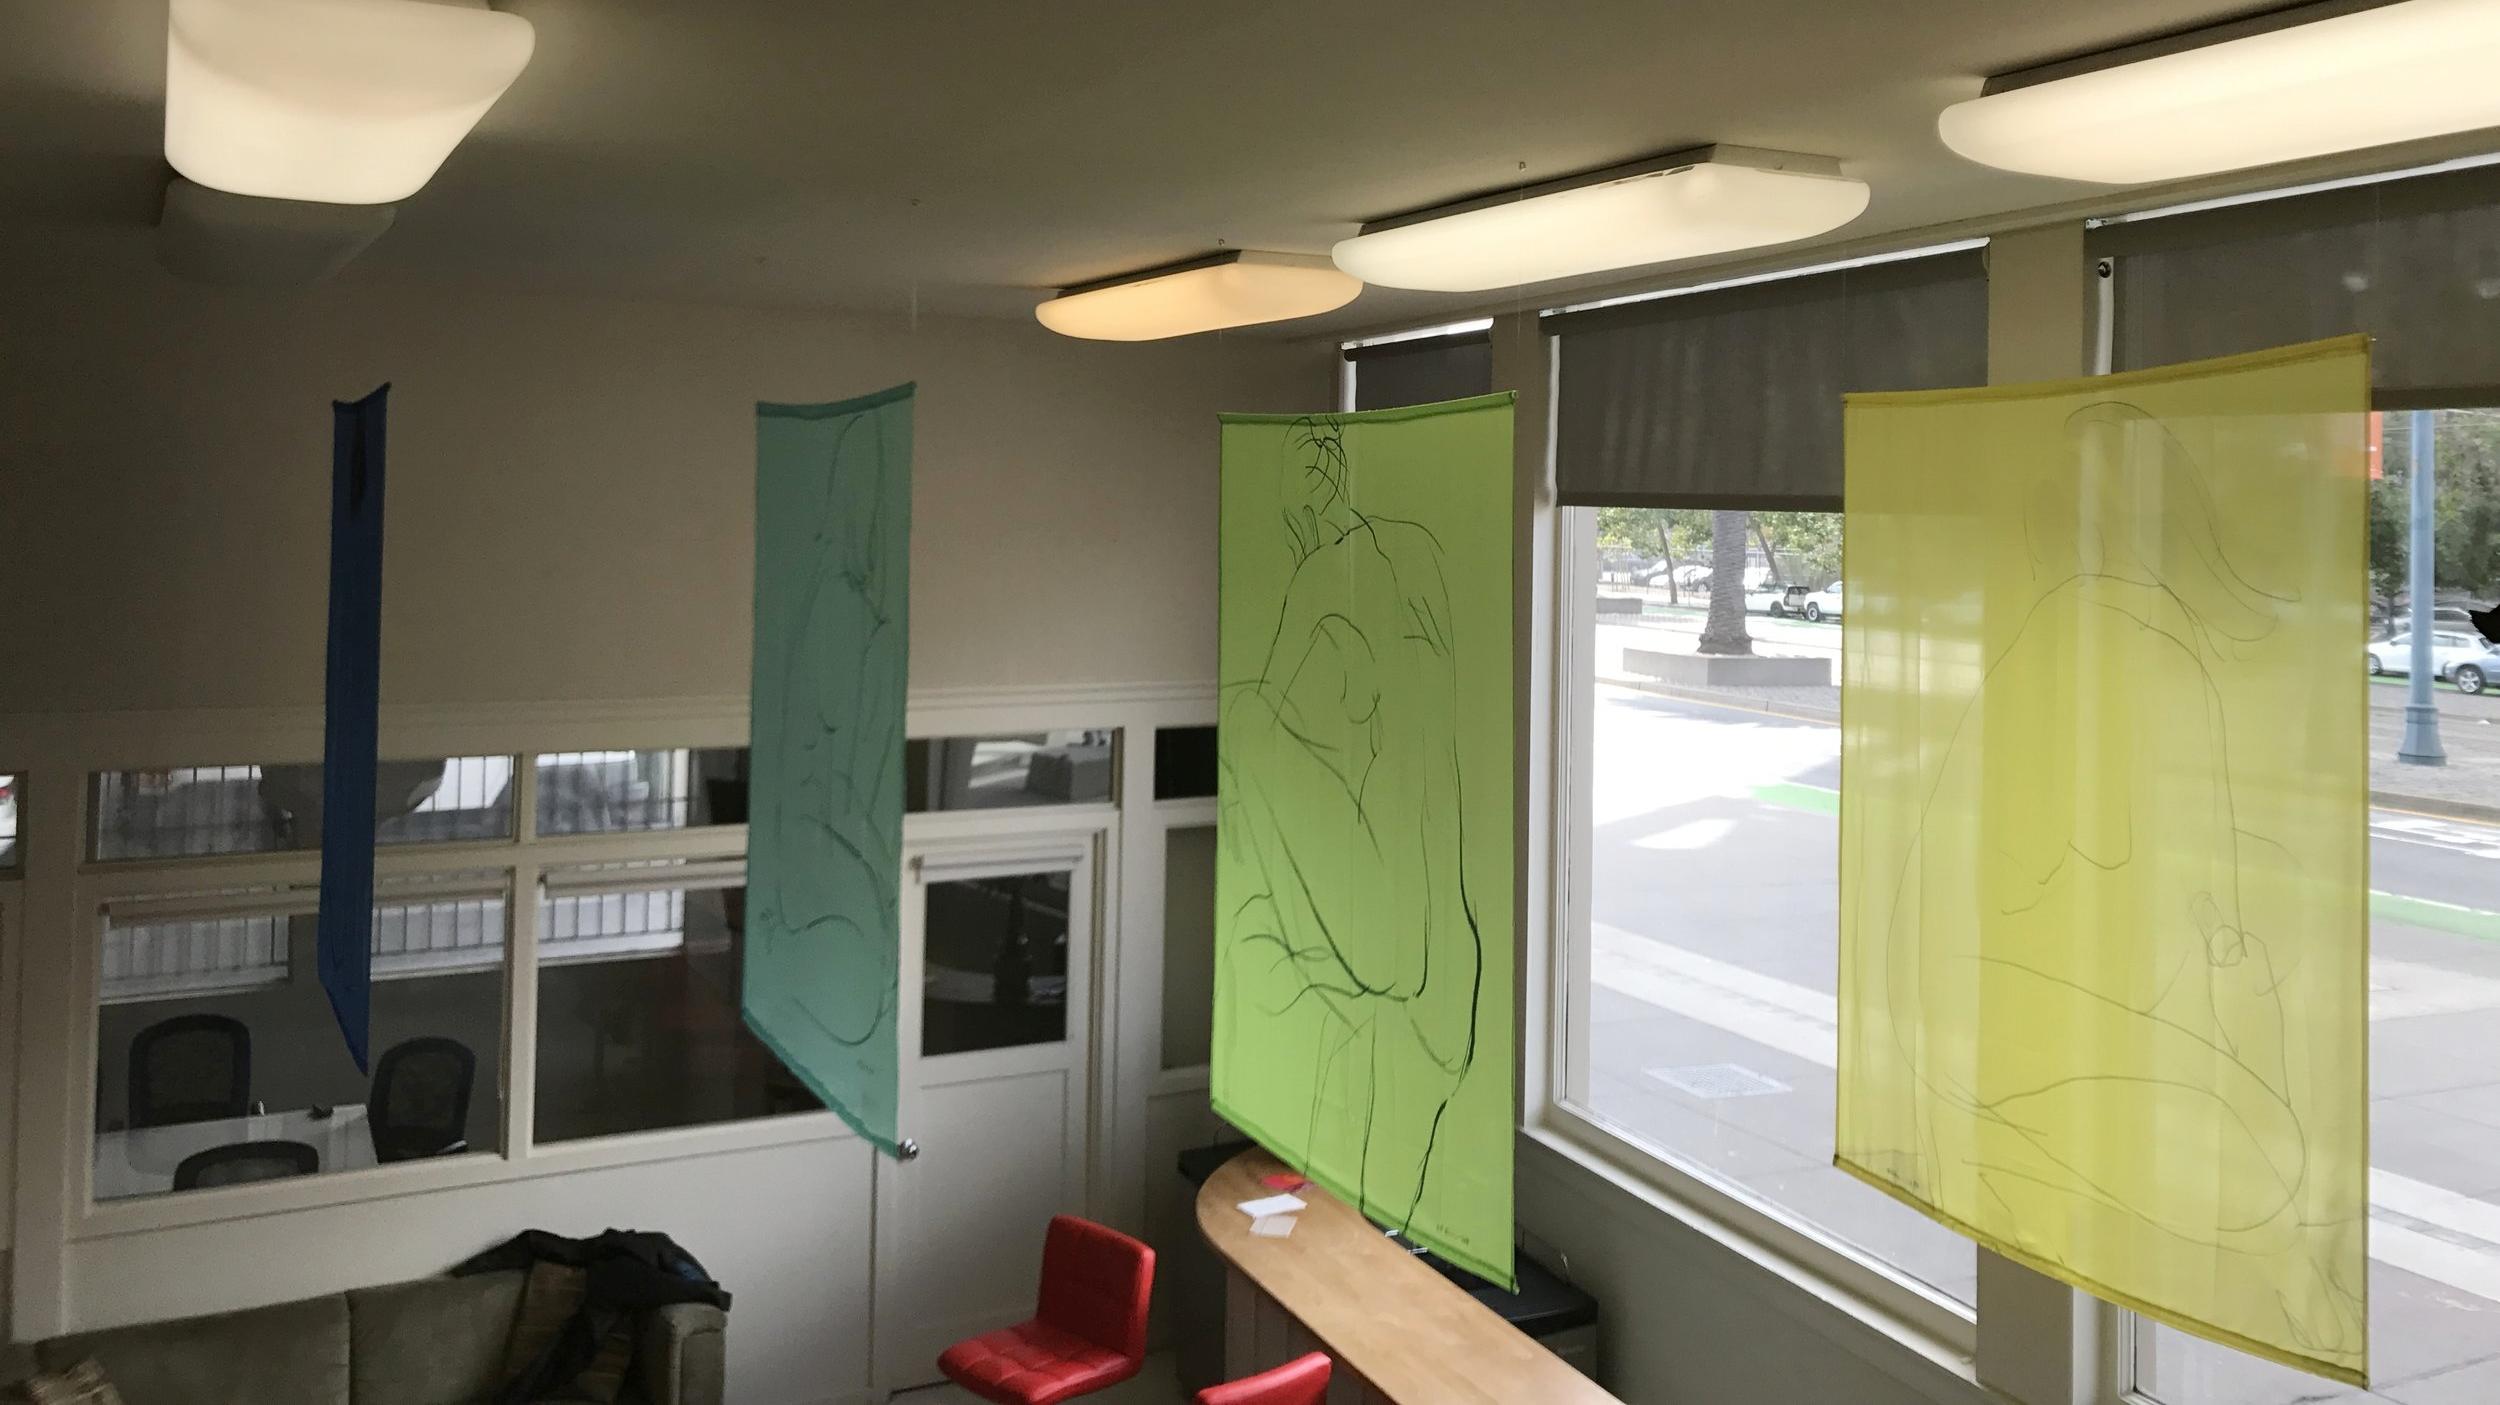 Banderas Series (5): Site-specific installation - gestural flags